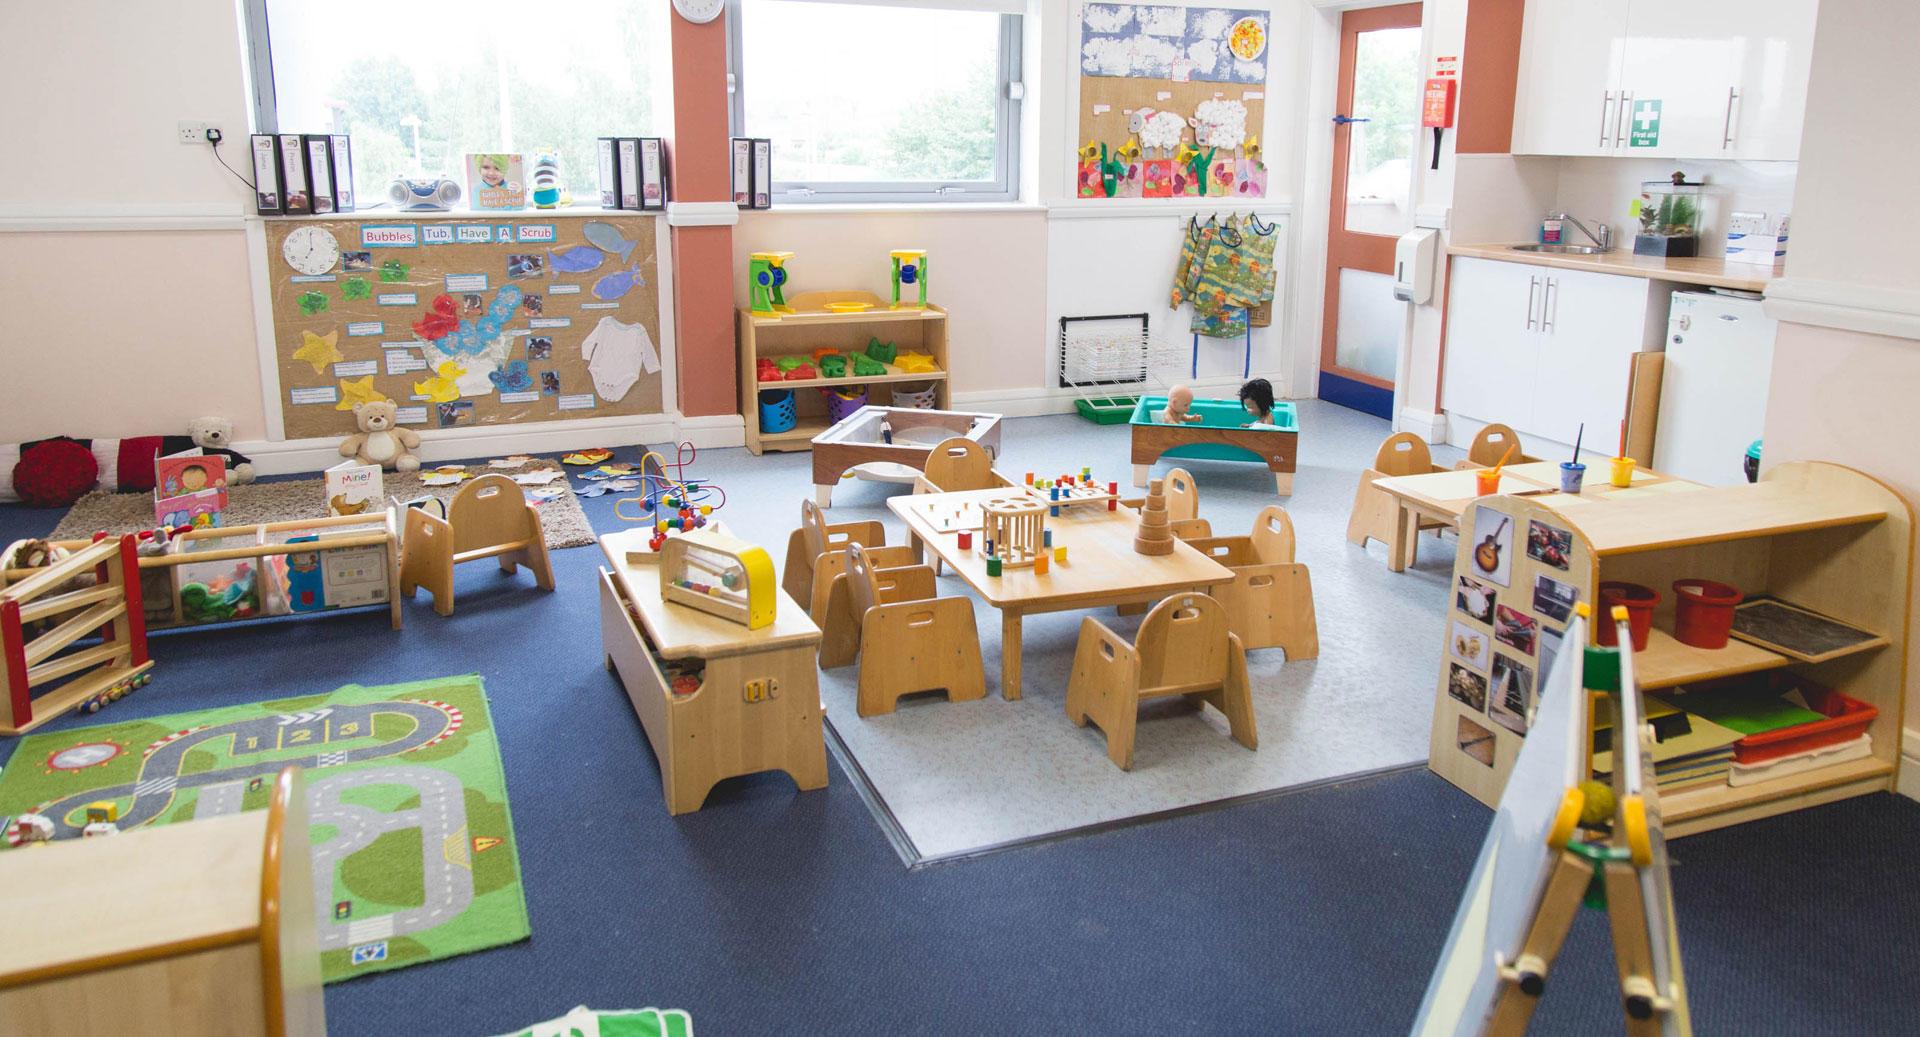 Asquith Riverside Pre-School & Day Nursery